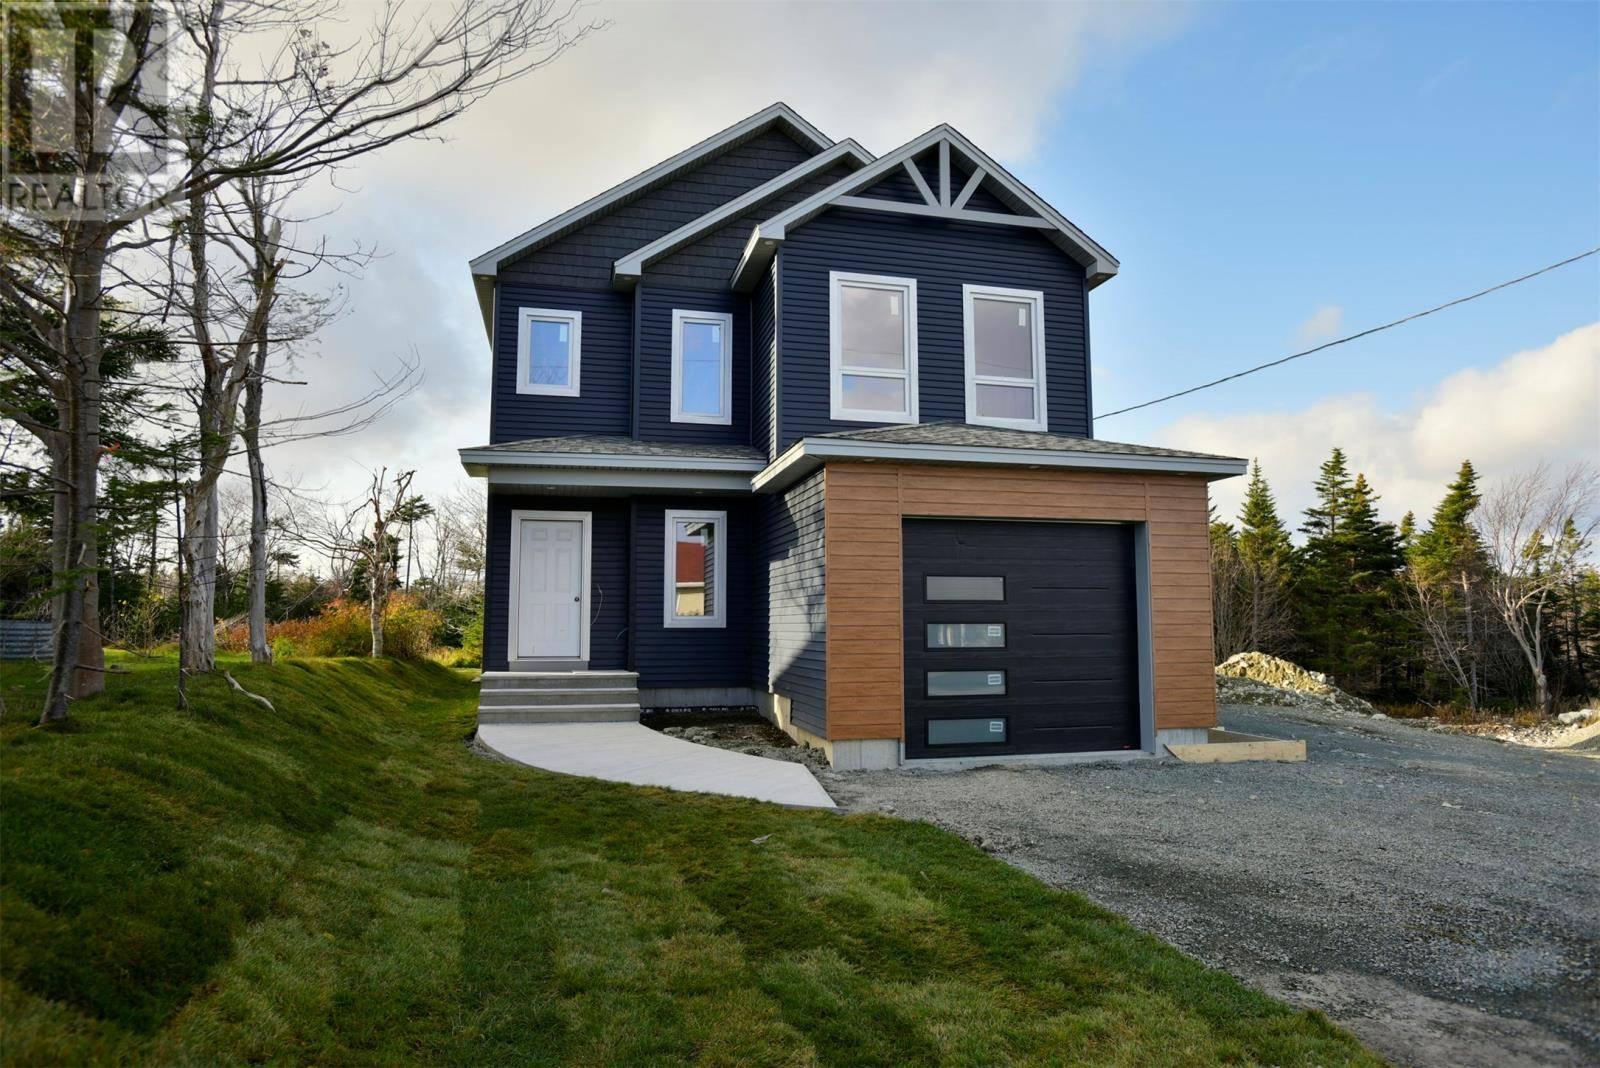 House for sale at 33 Malka Dr St. John's Newfoundland - MLS: 1207204